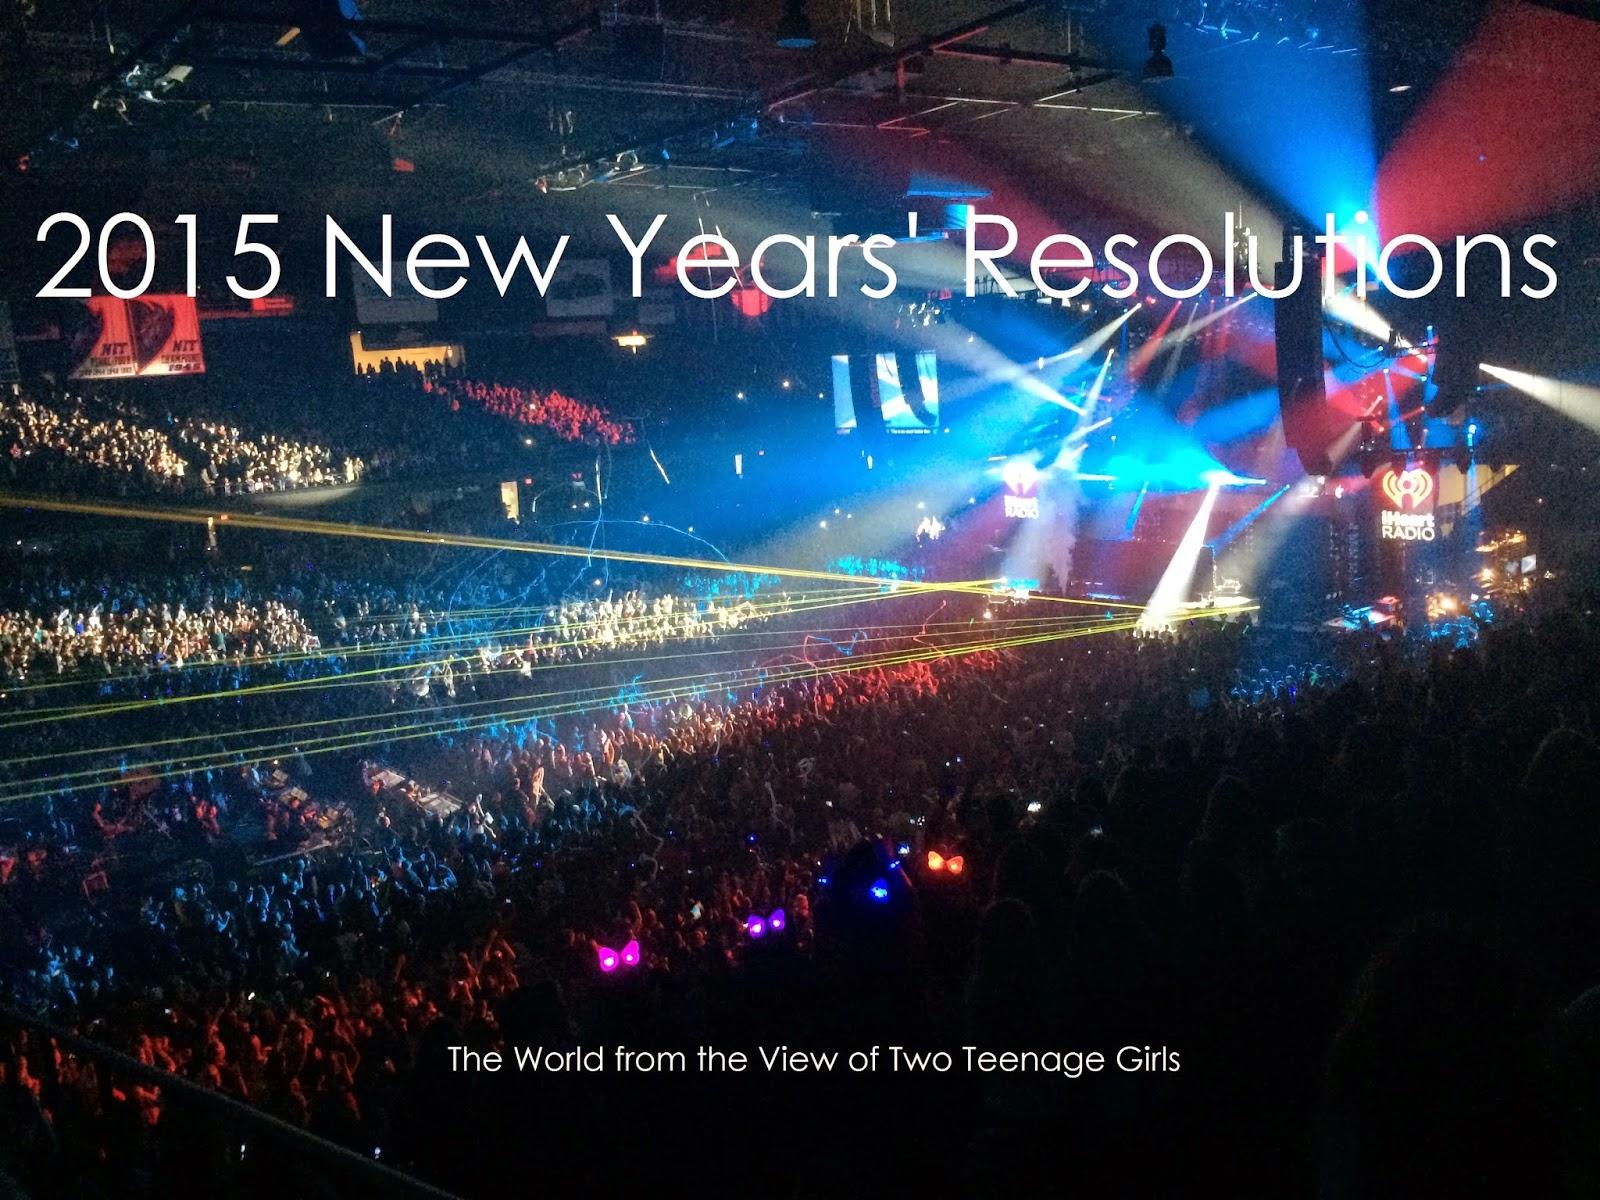 New Years 2015 Resolutions Goals Cassandra Polzin